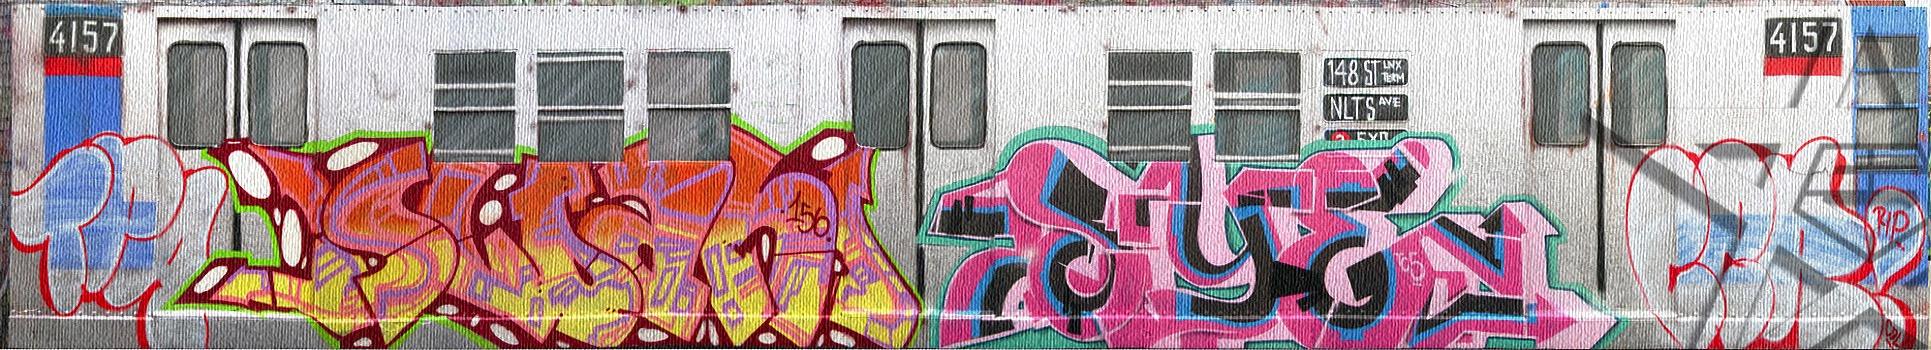 sloanandsye 2012 sm-1